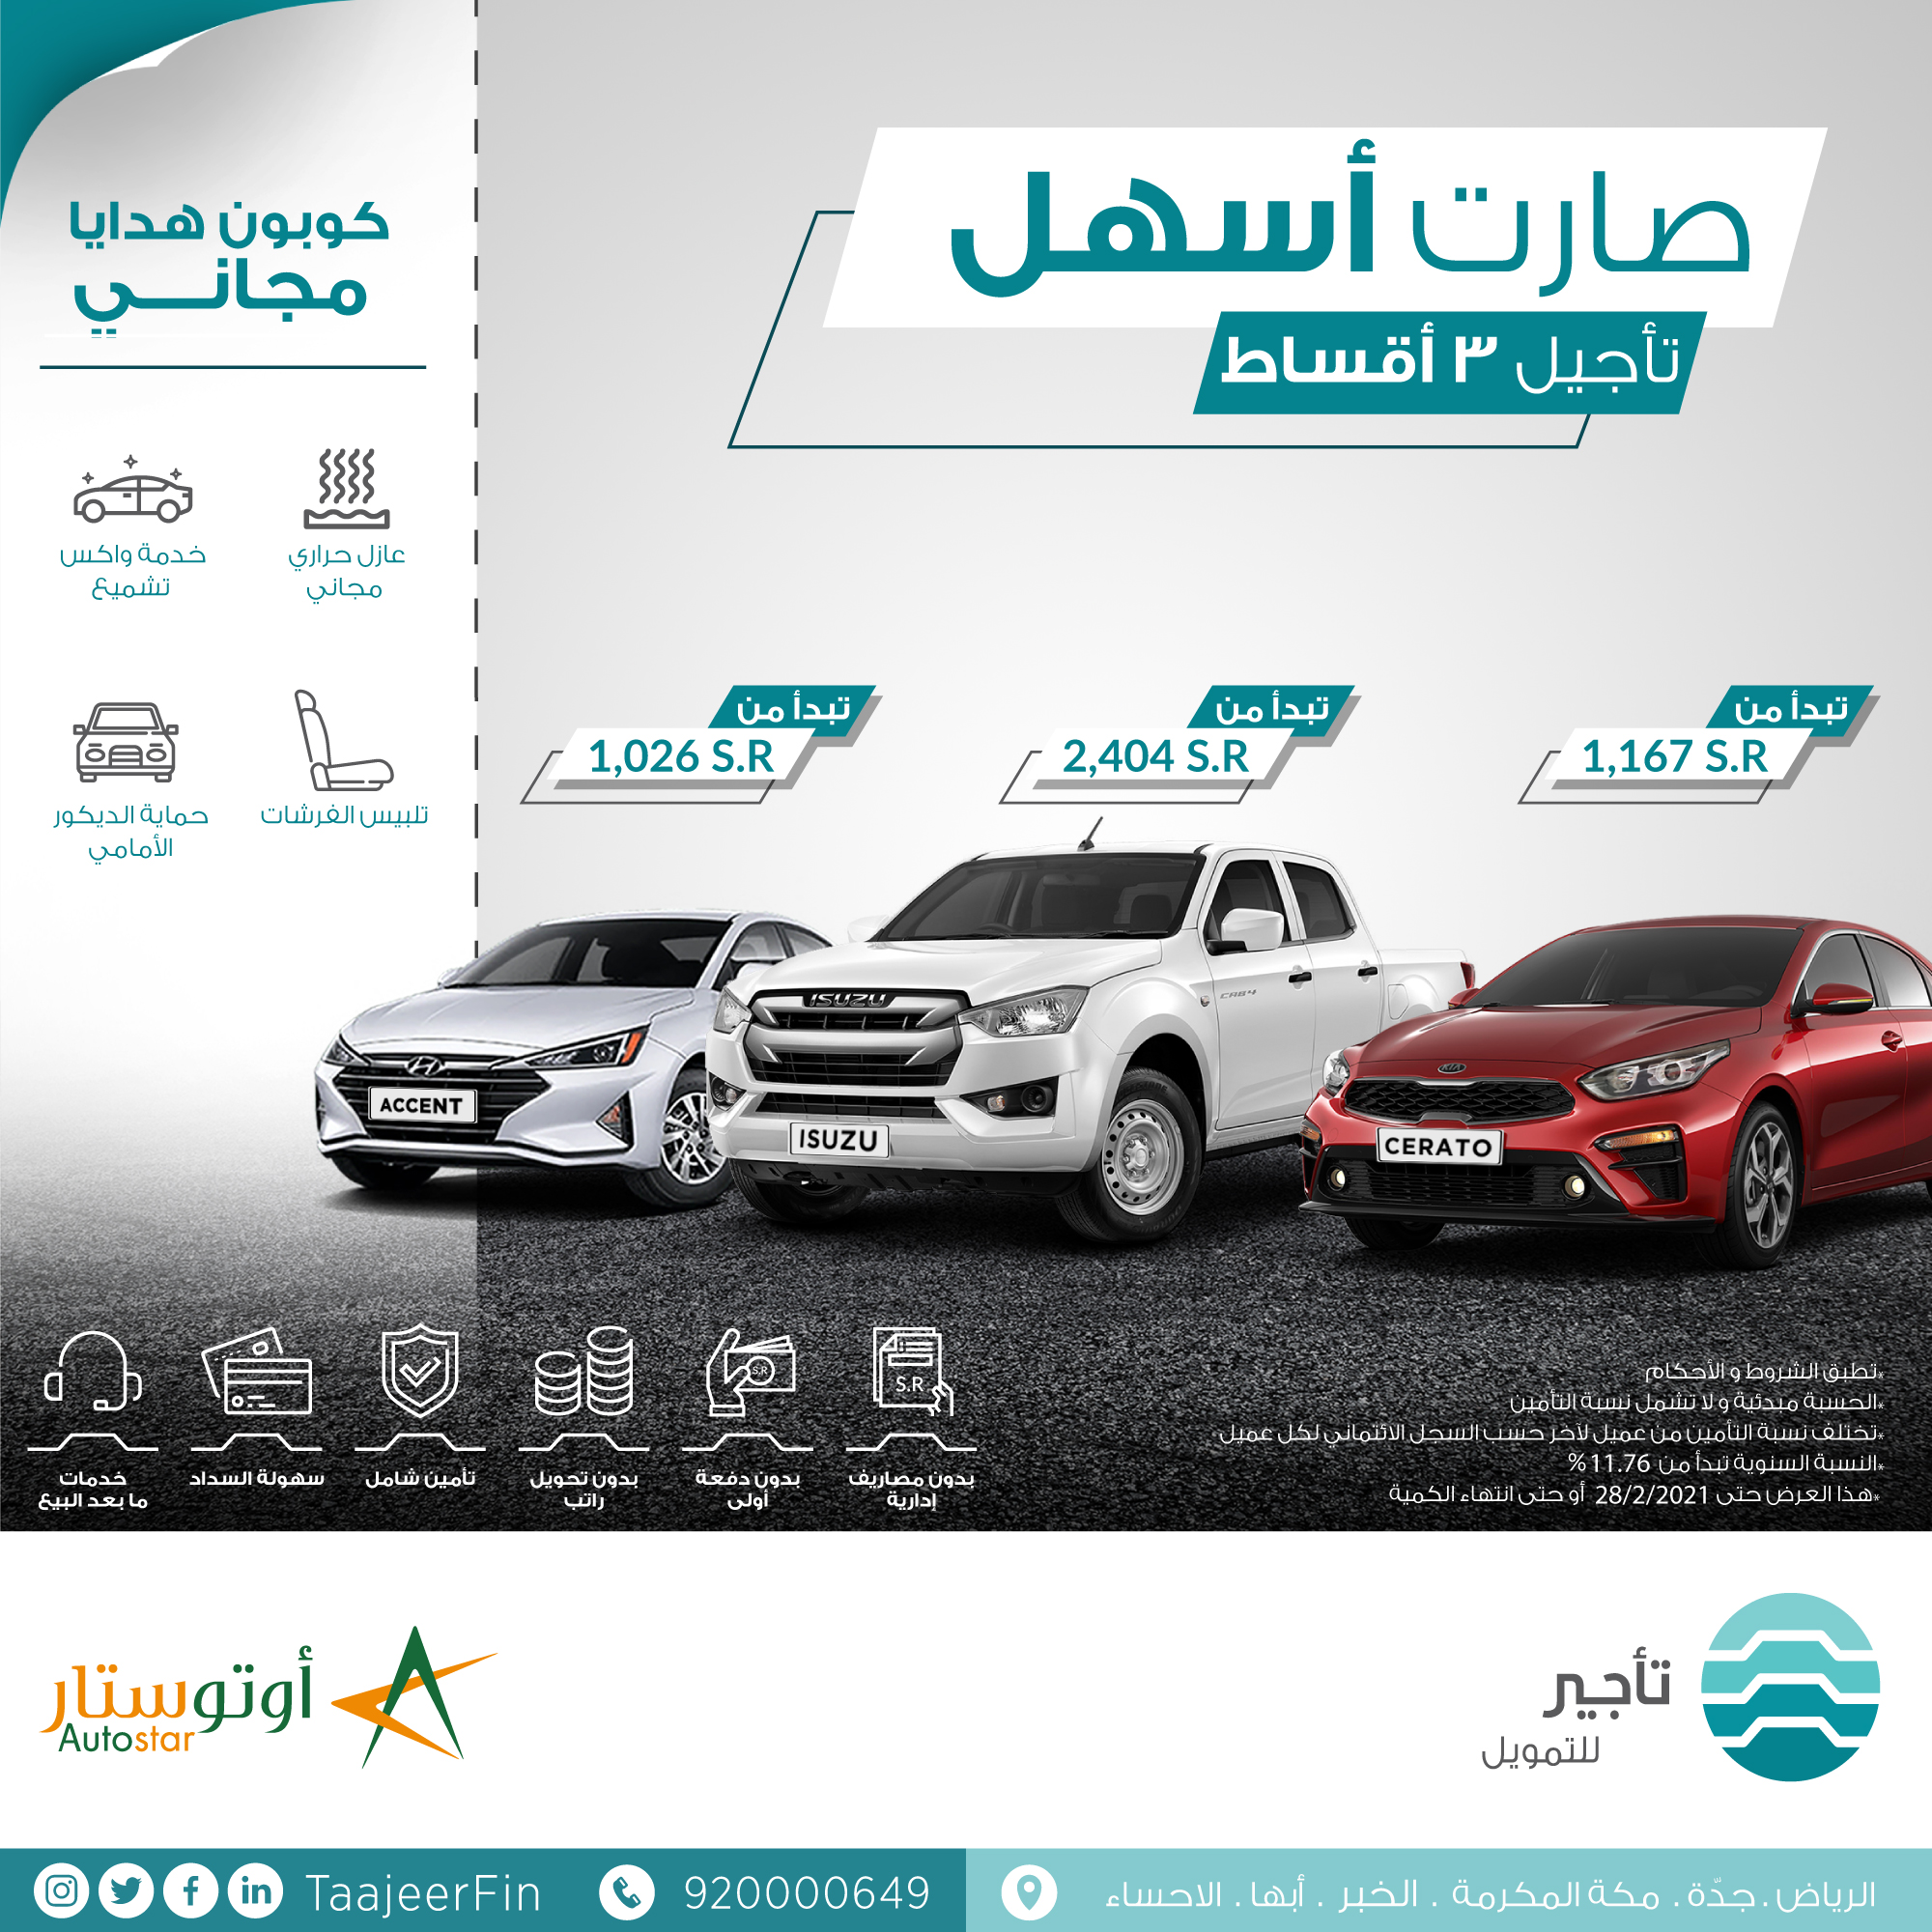 AutoStar offers